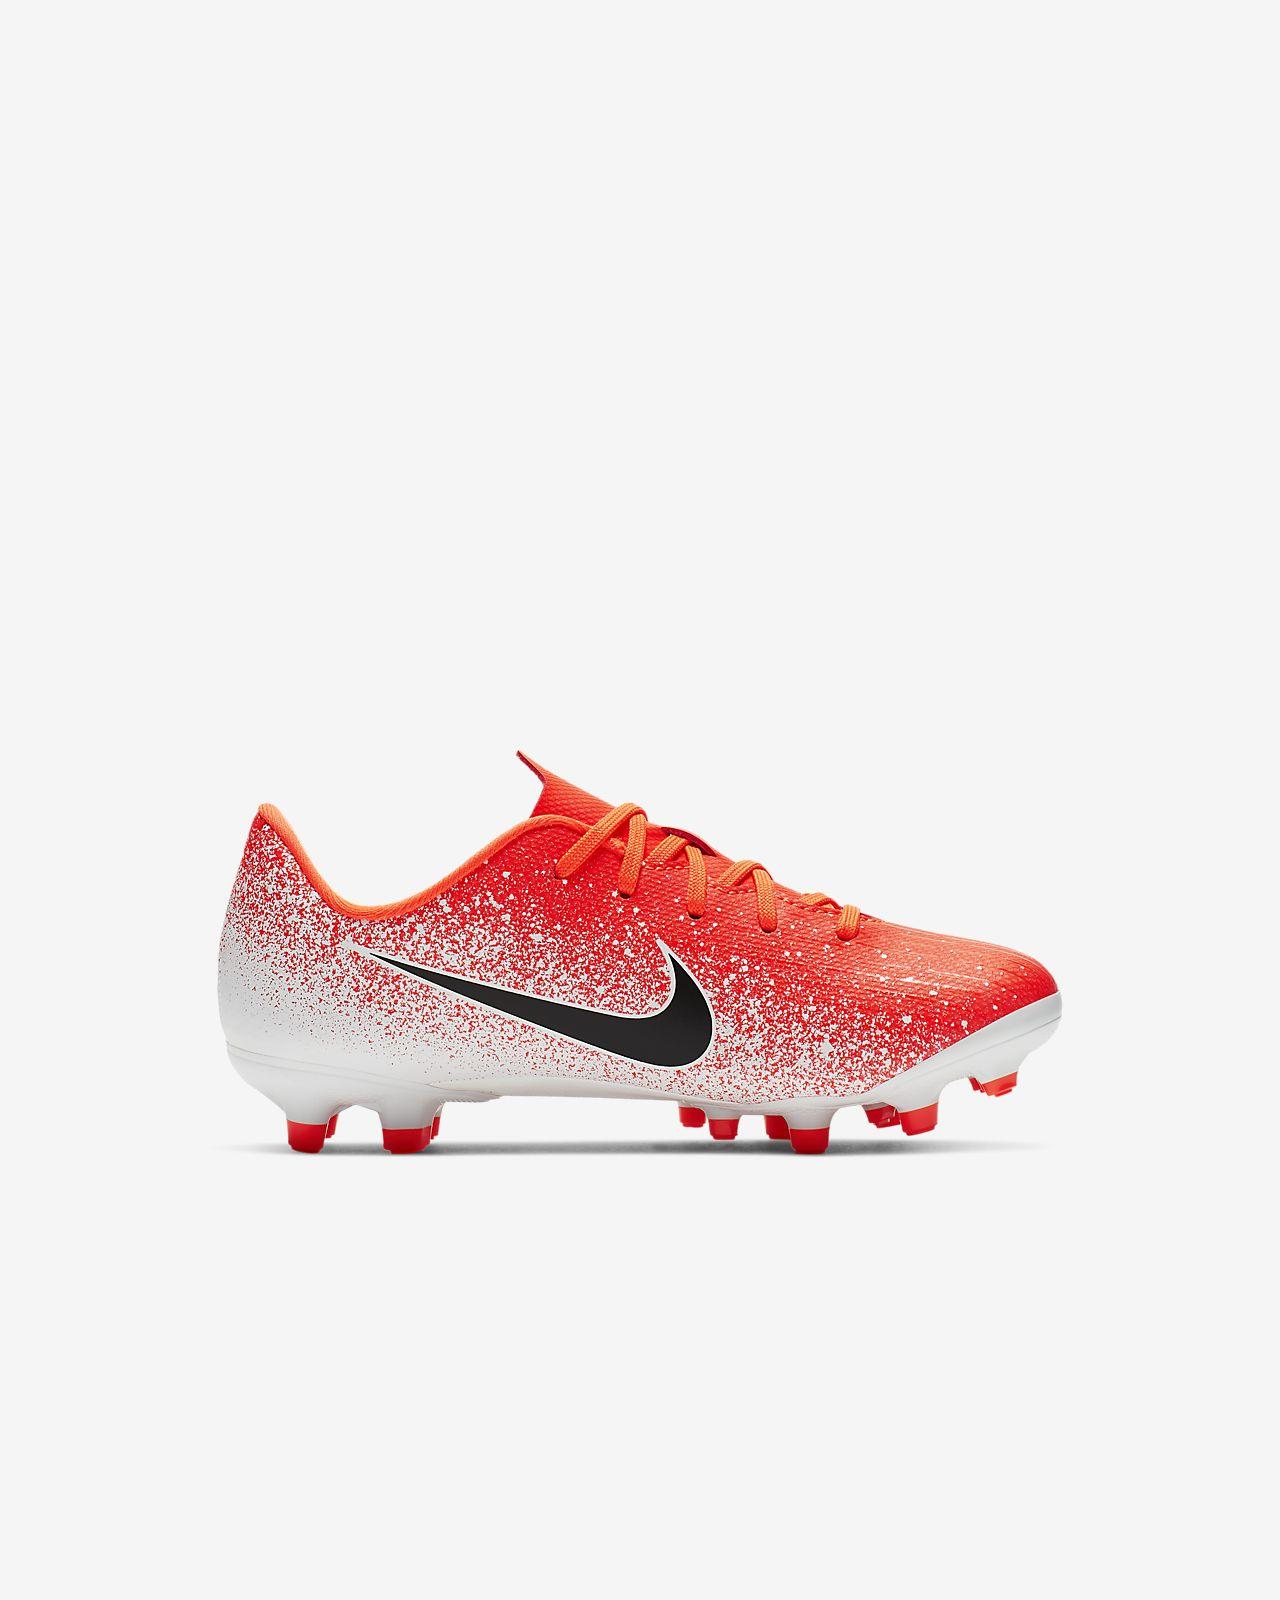 1653d8290 ... Nike Jr. MercurialX Vapor XII Academy Toddler Little Kids  Multi-Ground  Soccer